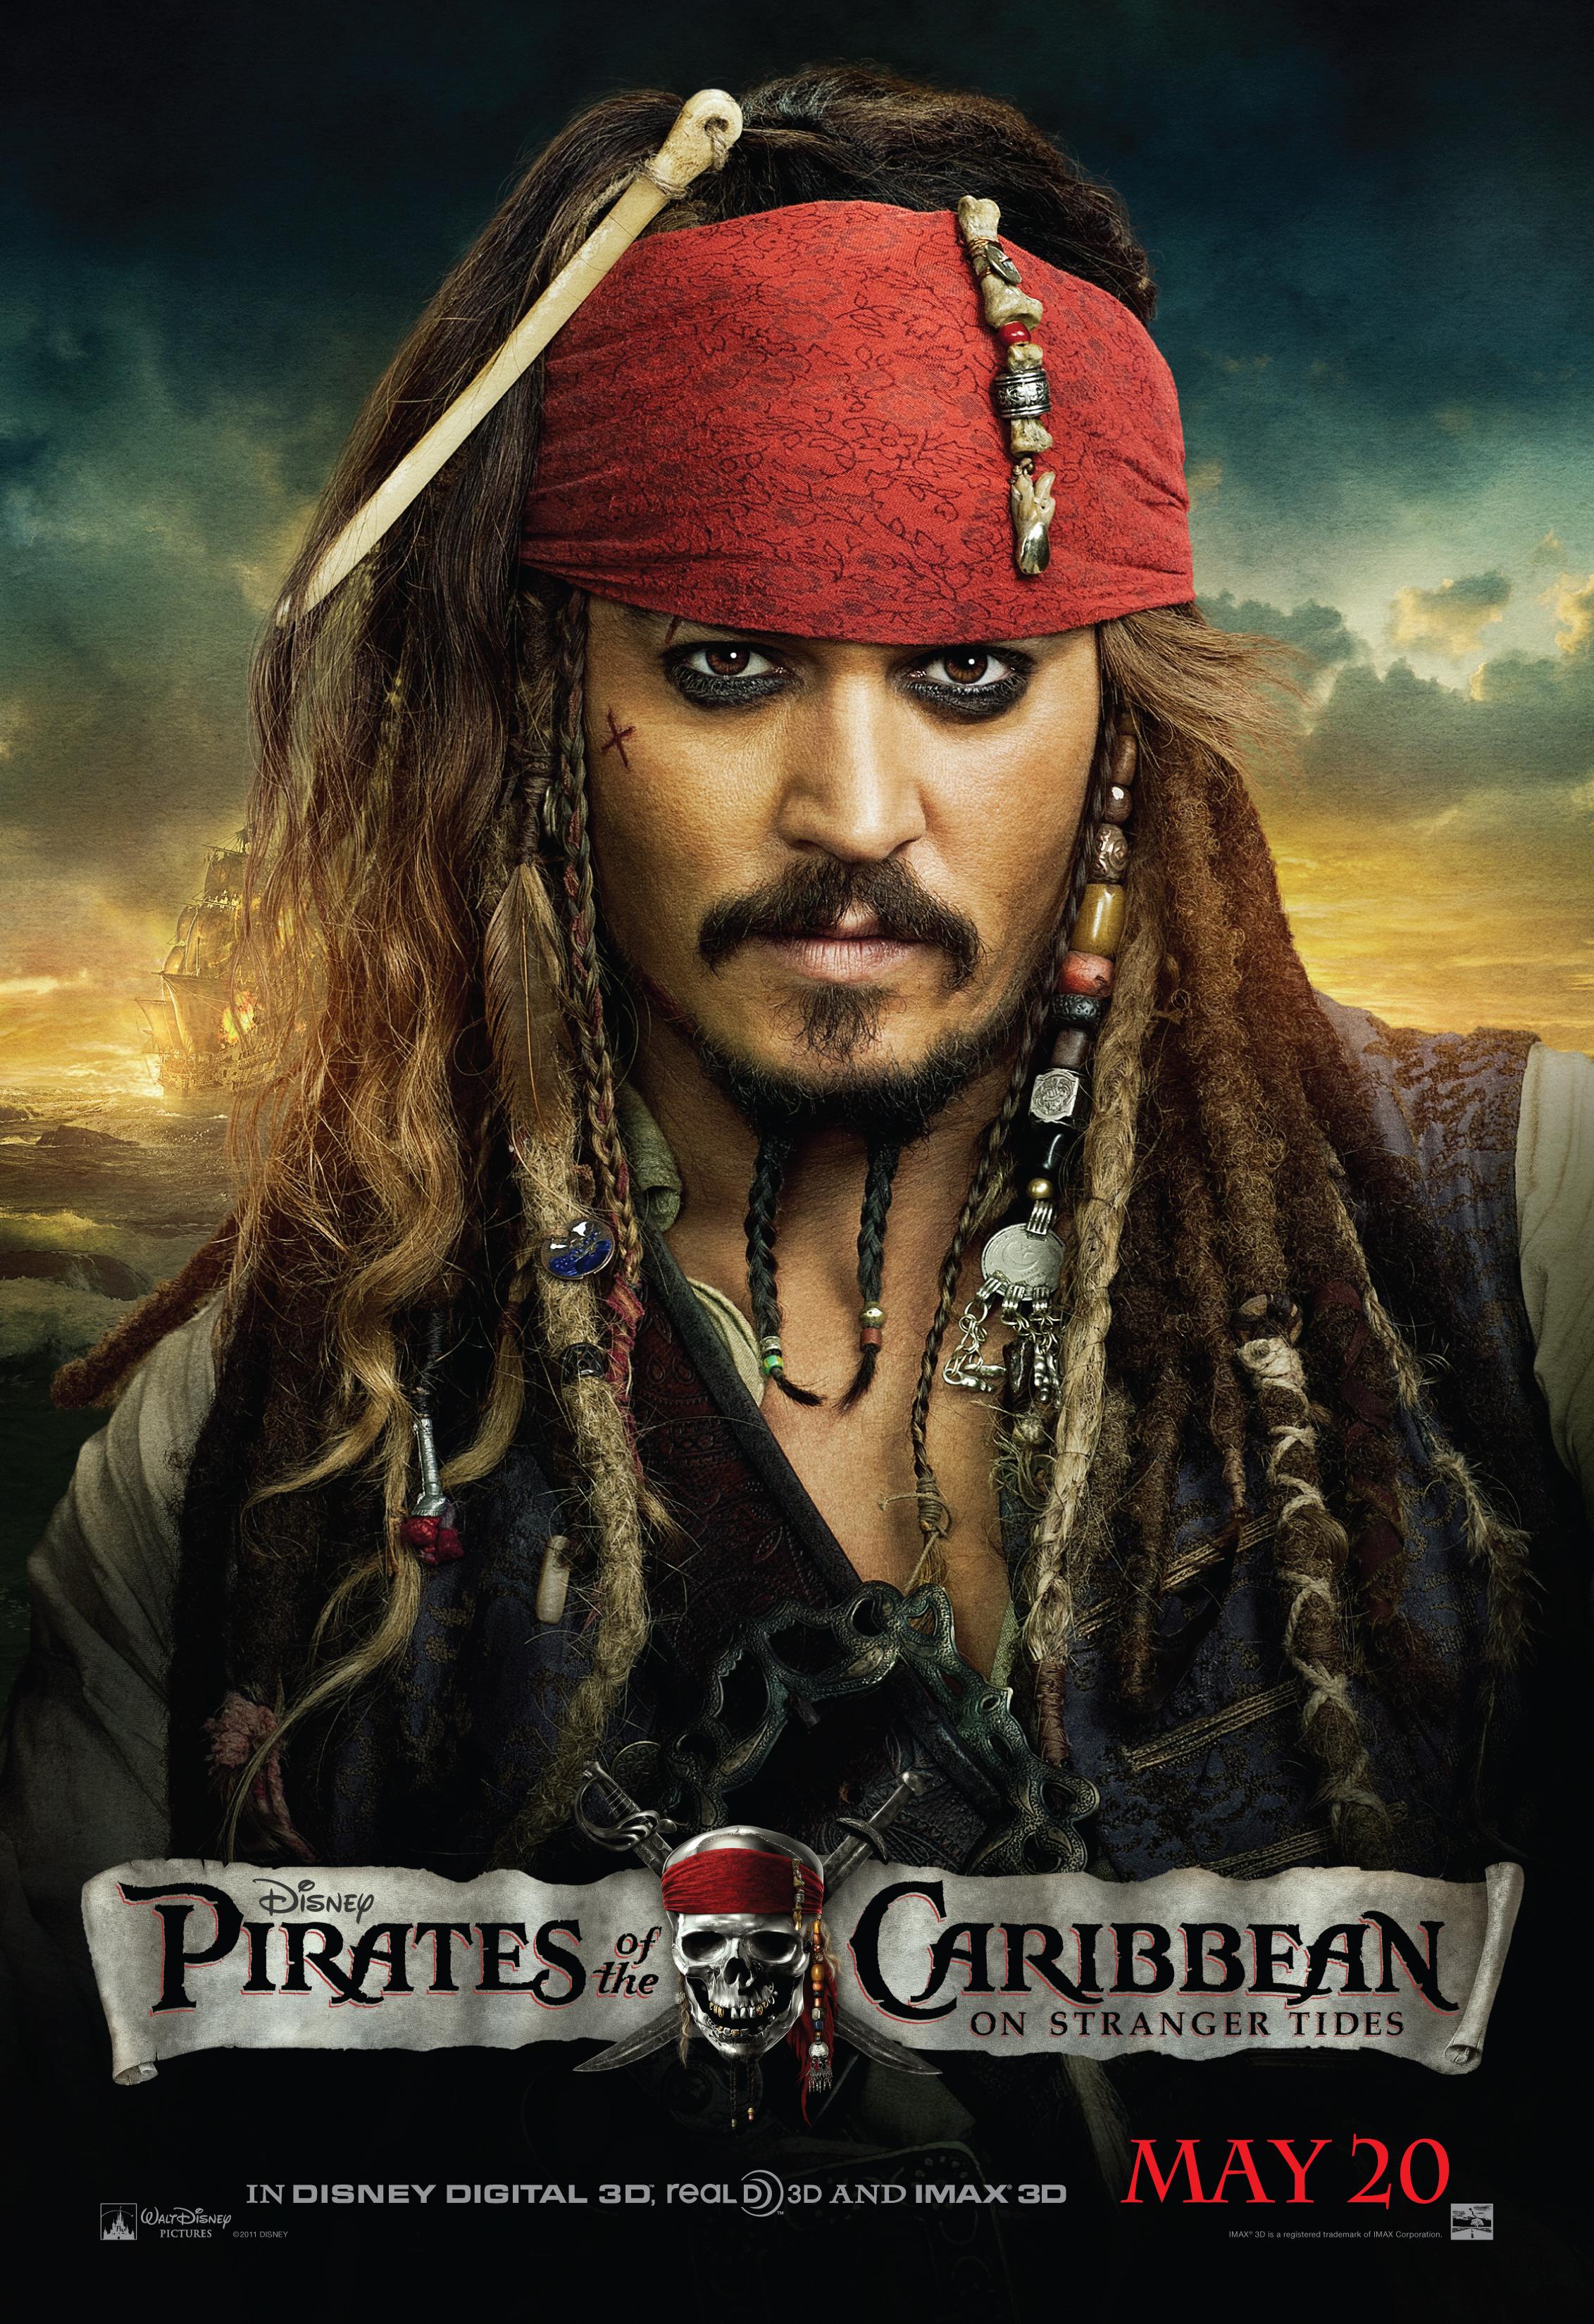 http://collider.com/wp-content/uploads/pirates-of-the-caribbean-on-stranger-tides-johnny-depp-poster-01.jpg